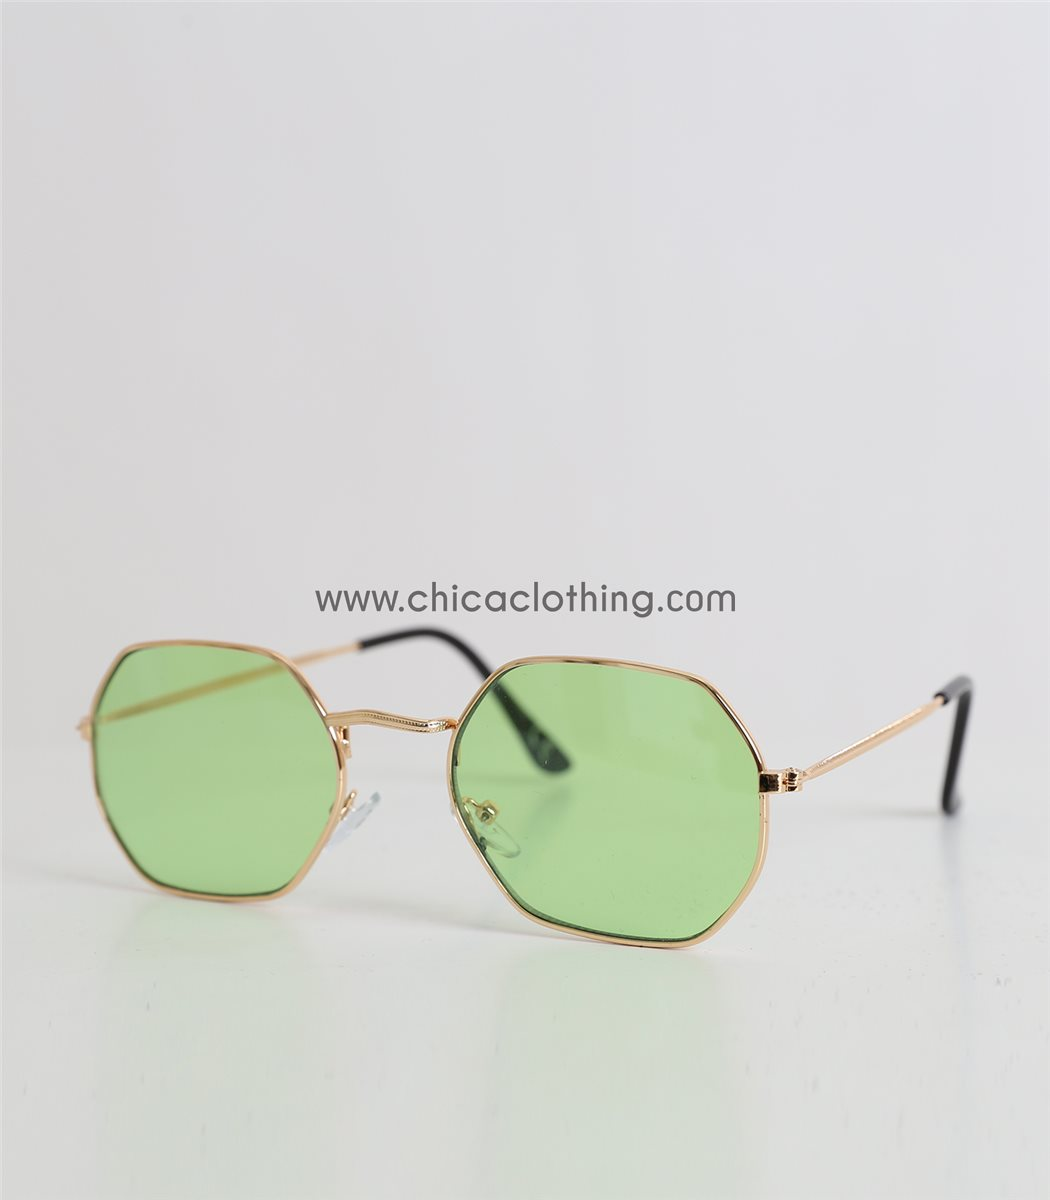 aa3b40e49b Γυναικεία γυαλιά ηλίου με πολύγωνο σκελετό και ανοικτό-πράσινο φακό